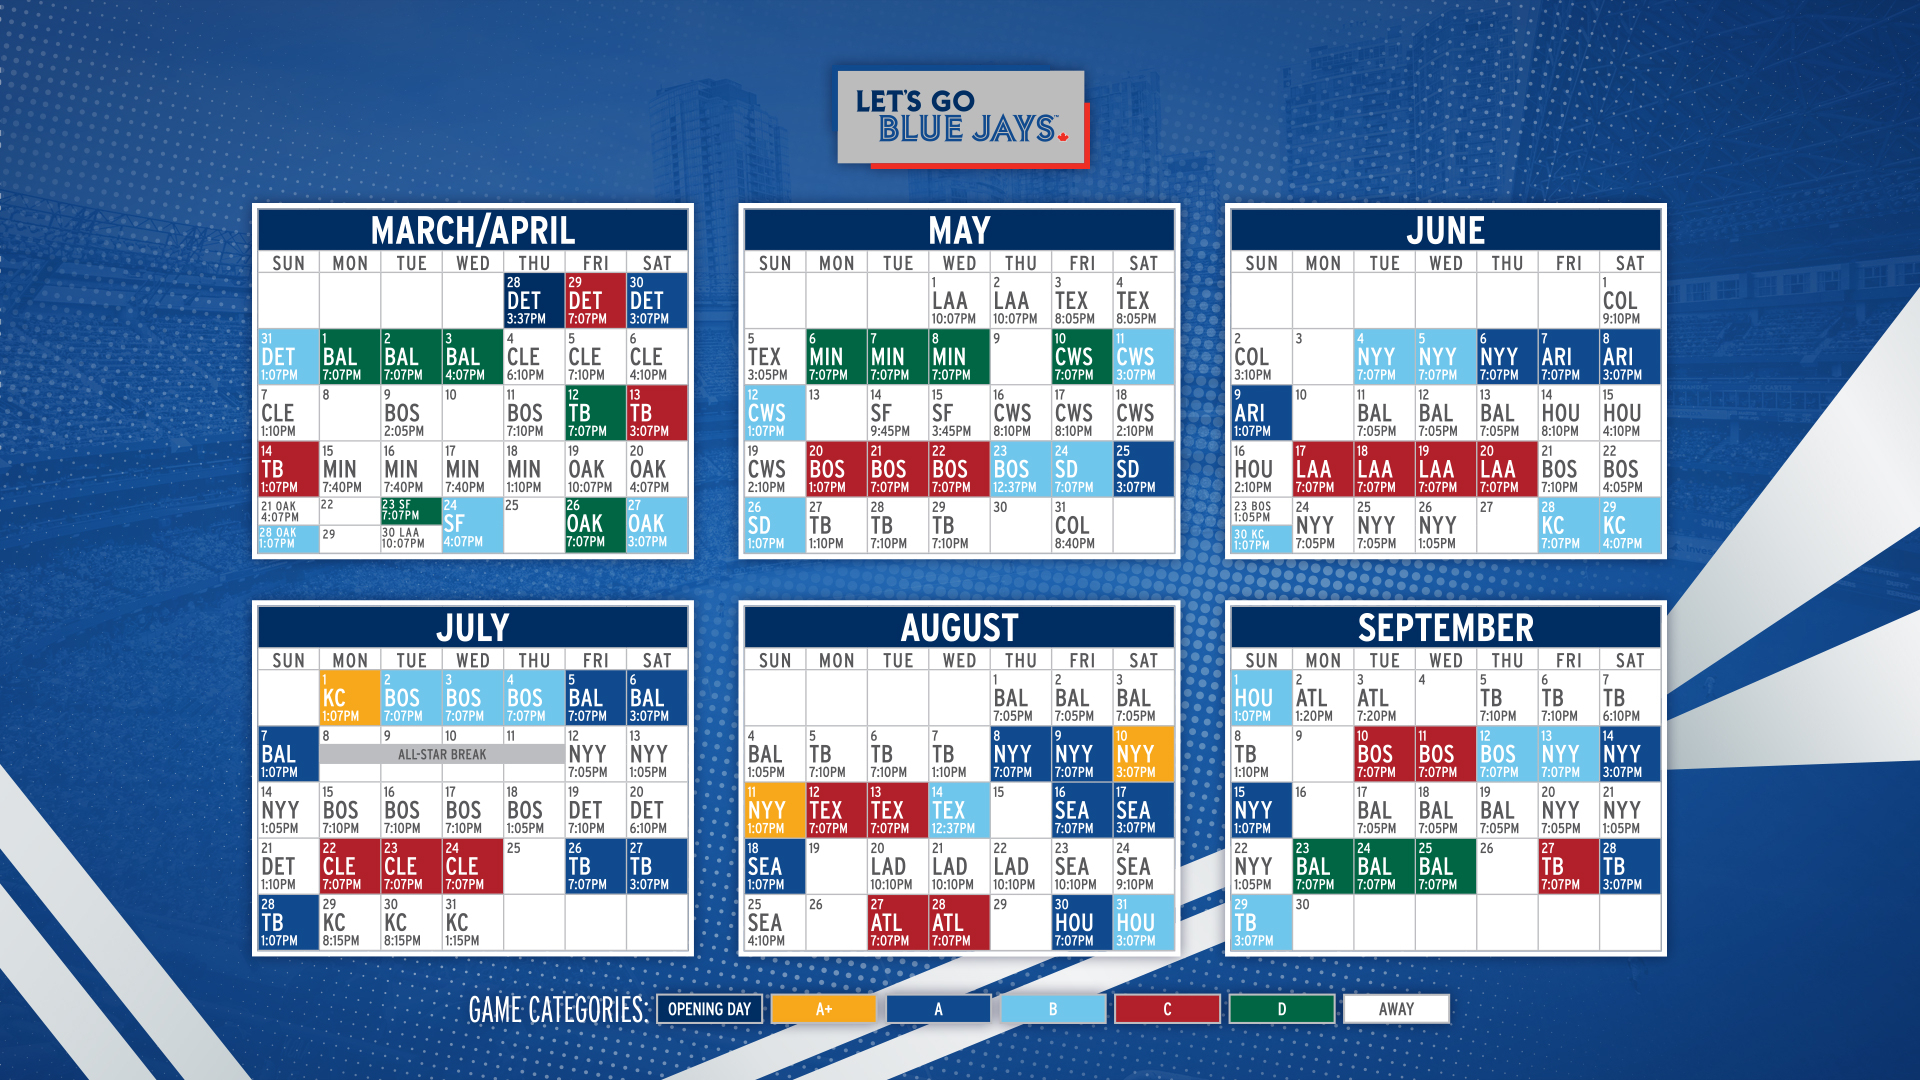 Atlanta Braves Schedule 2020 Printable | Calendar For Planning regarding Atlanta Braves Schedule Calendar